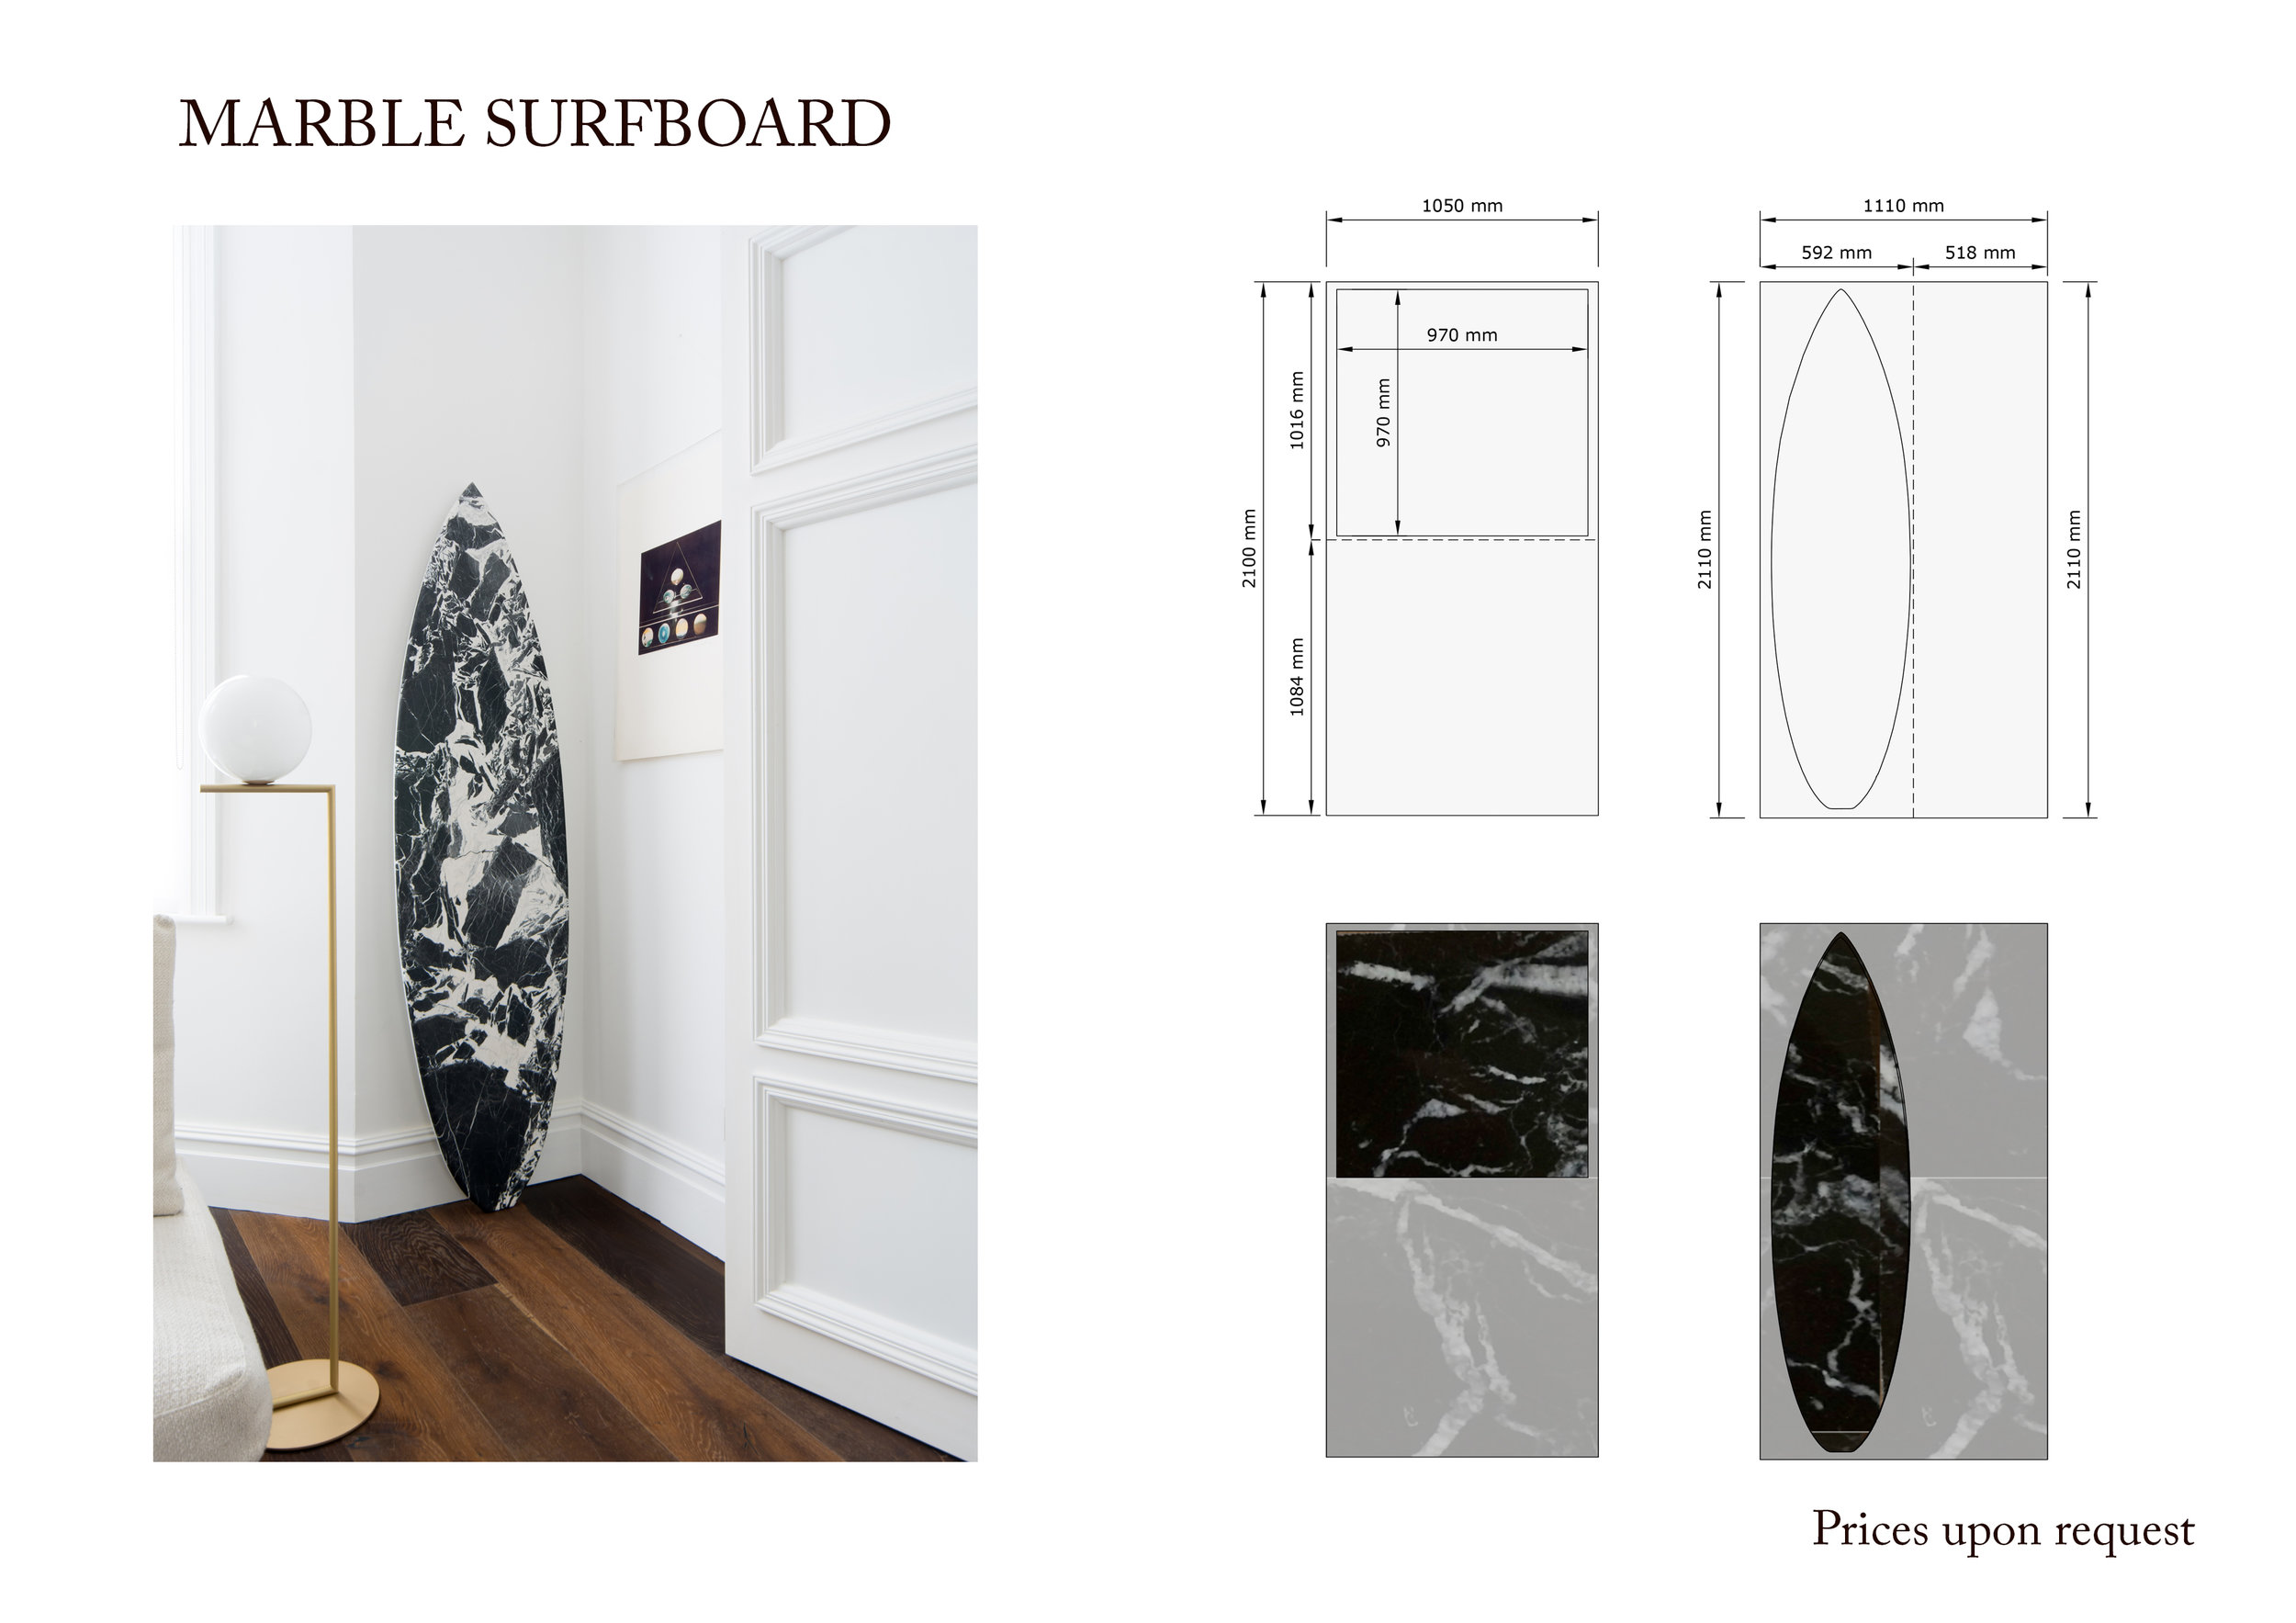 MARBLESurfboard.jpg